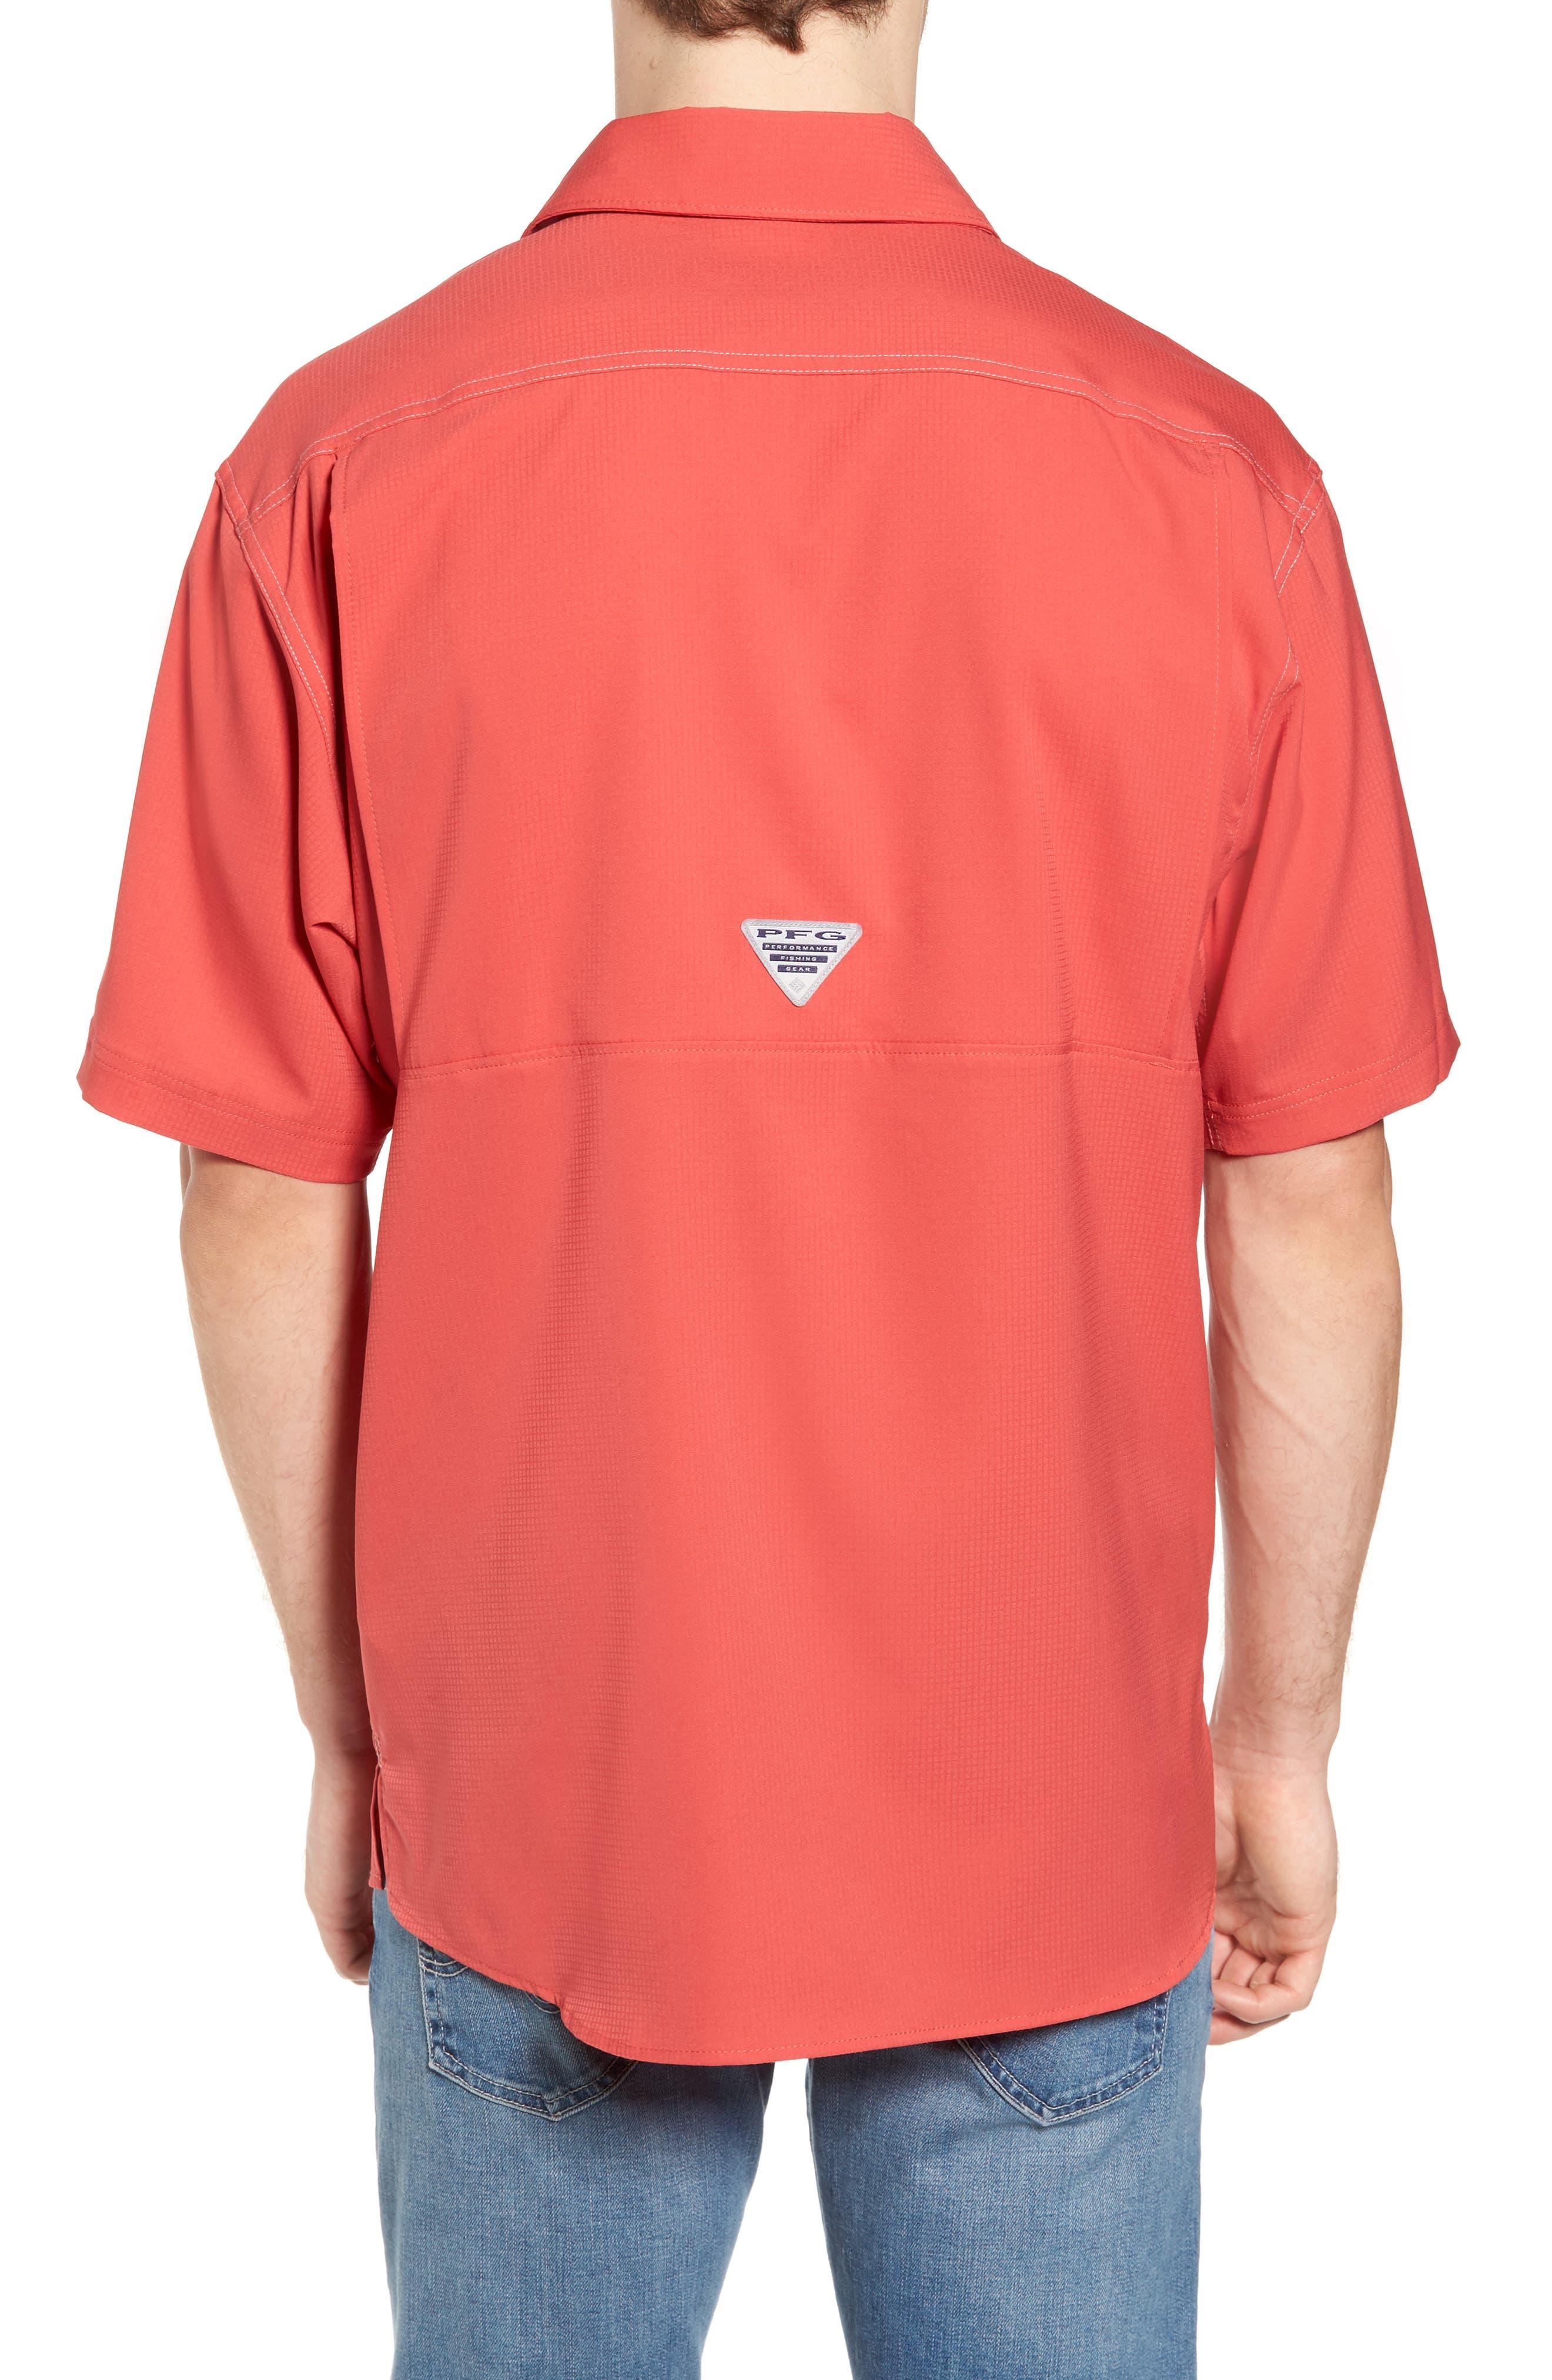 PFG Low Drag Offshore Woven Shirt,                             Alternate thumbnail 2, color,                             Sunset Red